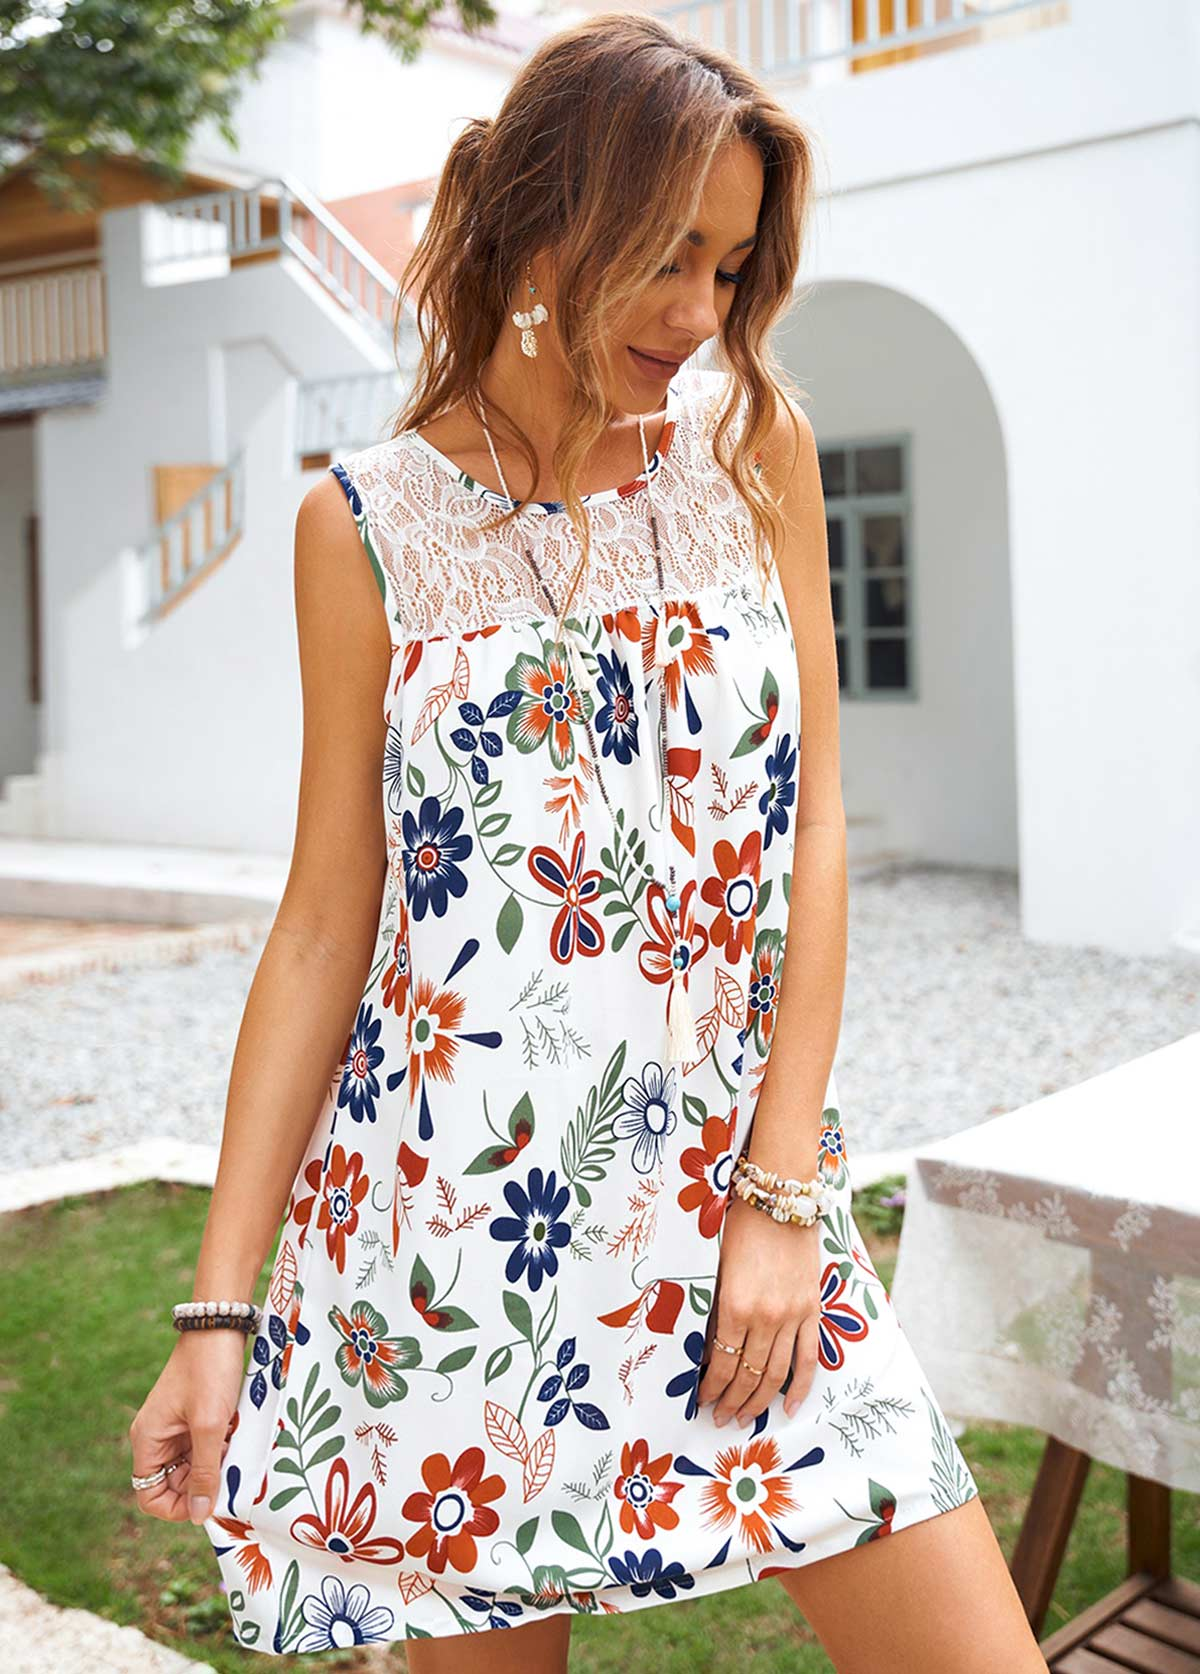 Sleeveless Floral Print Lace Stitching Dress